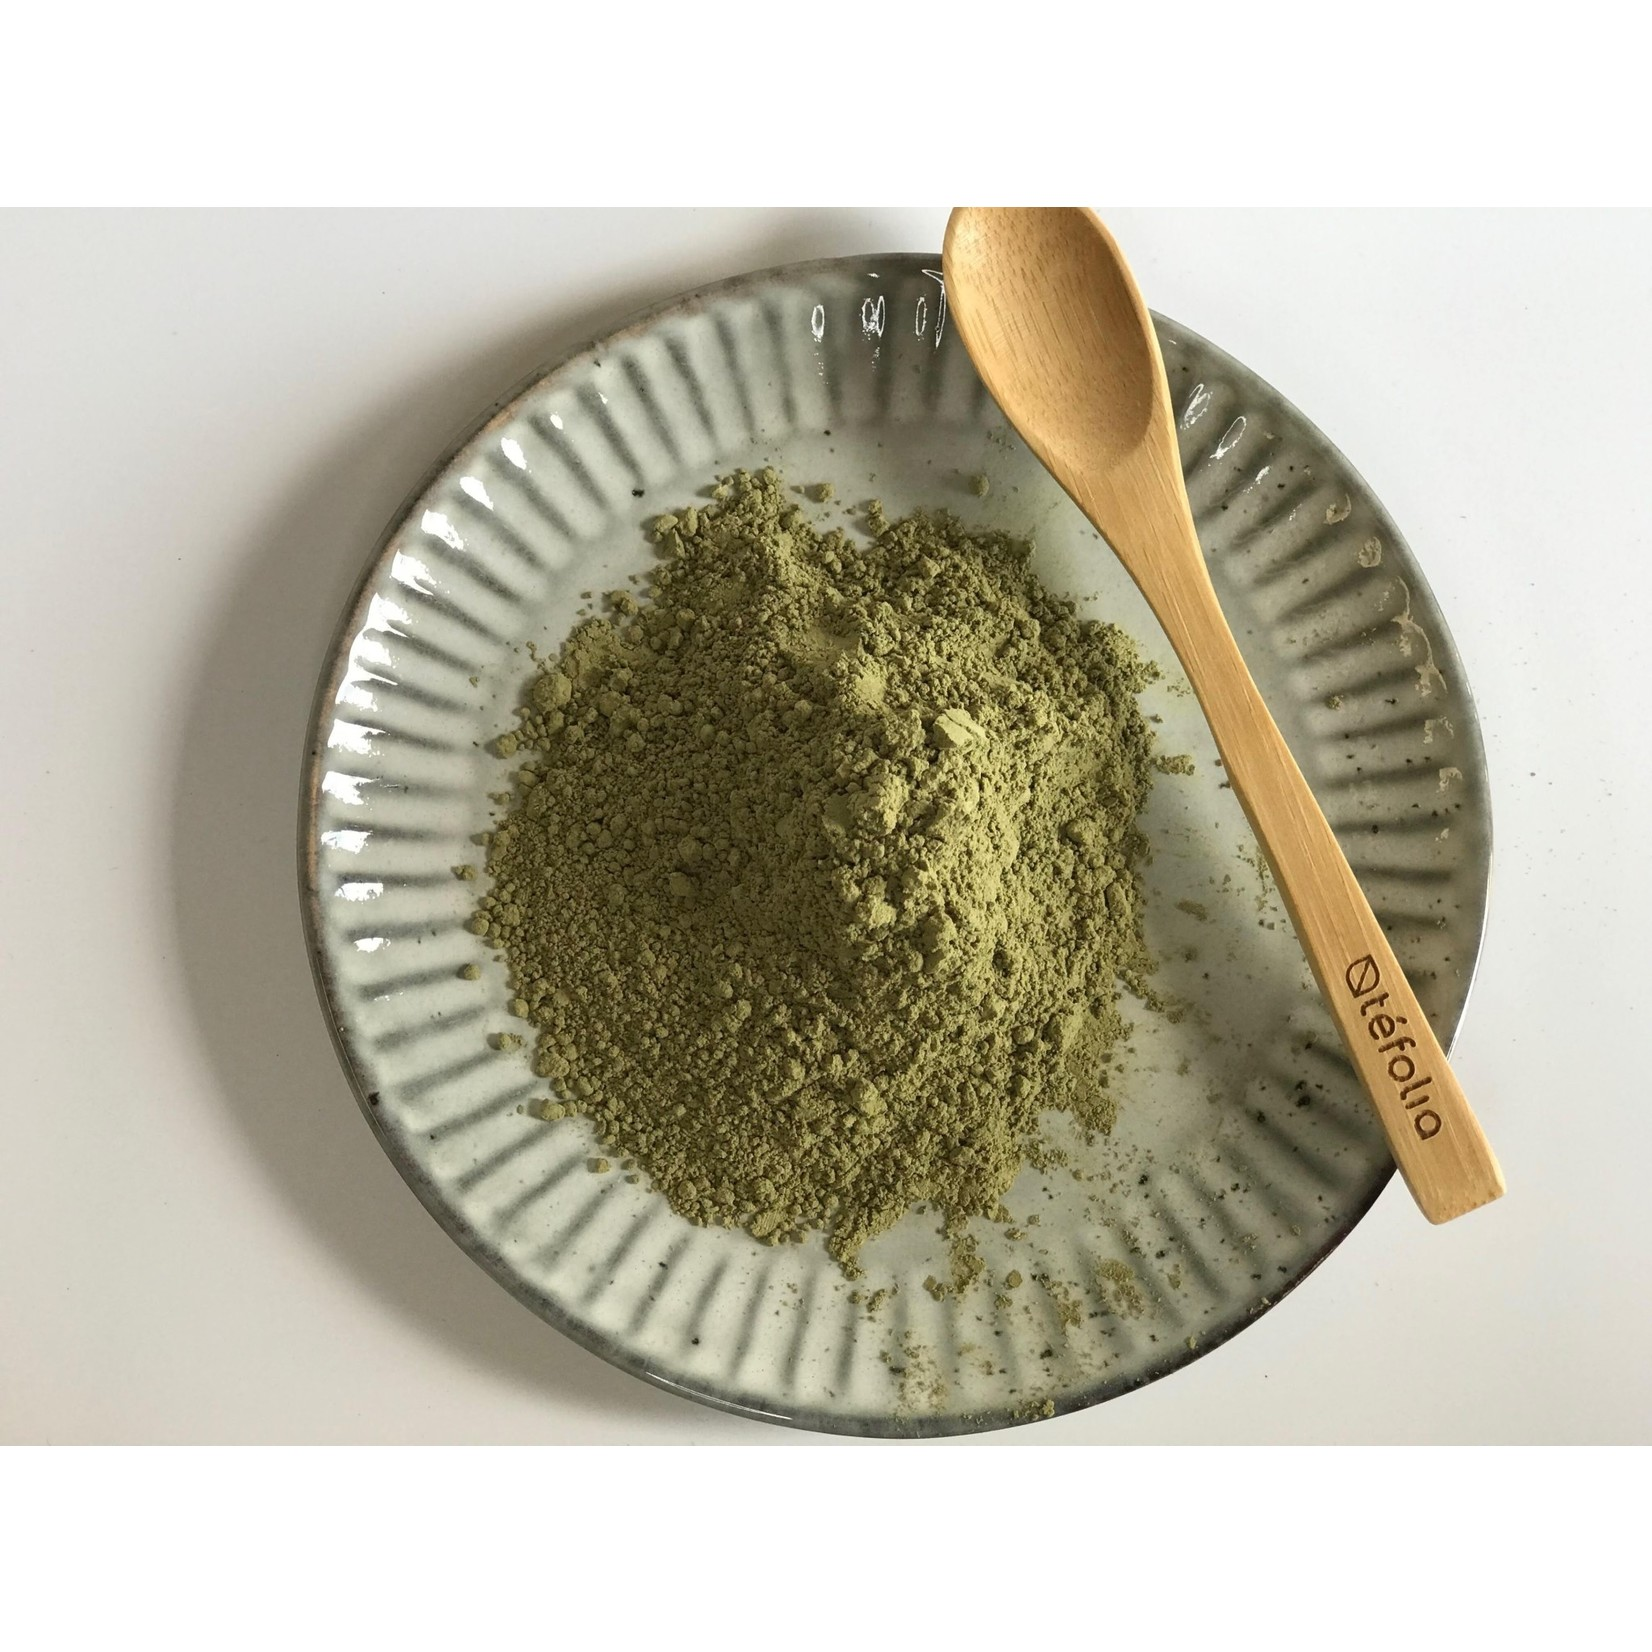 TeFolia TeFolia - Matcha Green Tea Powder - 2.2 lb/1kg, 58280-136